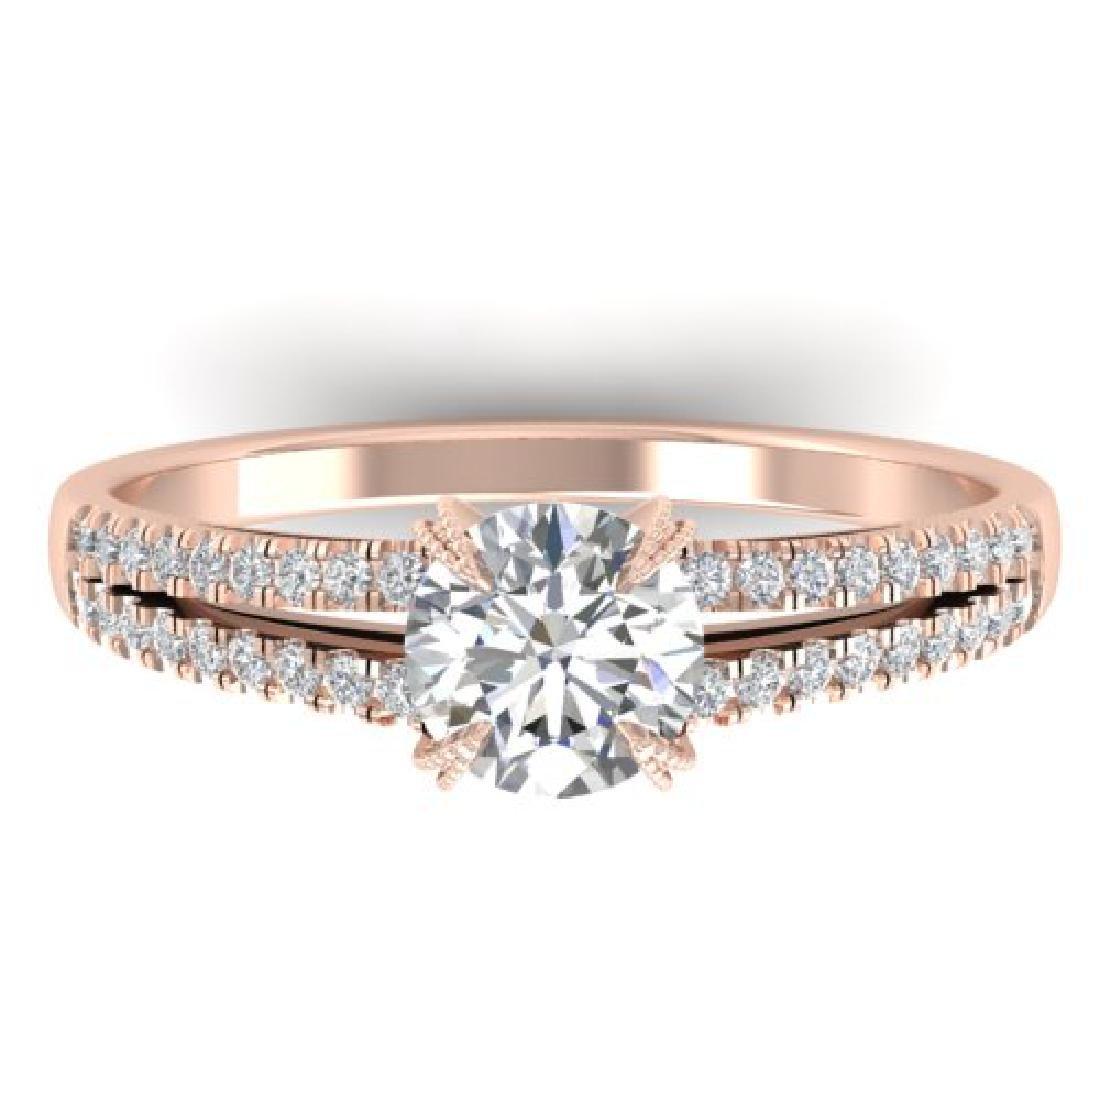 1.11 CTW Certified VS/SI Diamond Solitaire Art Deco